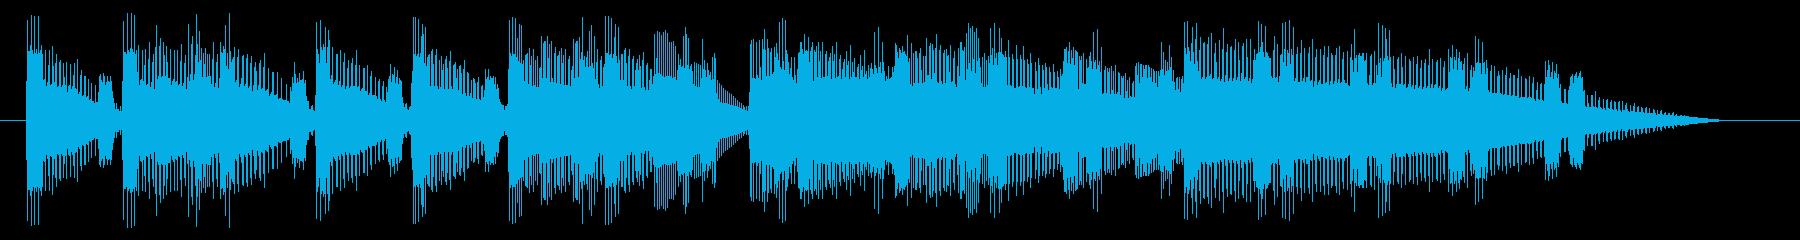 NES STG B04-1(スタート)の再生済みの波形